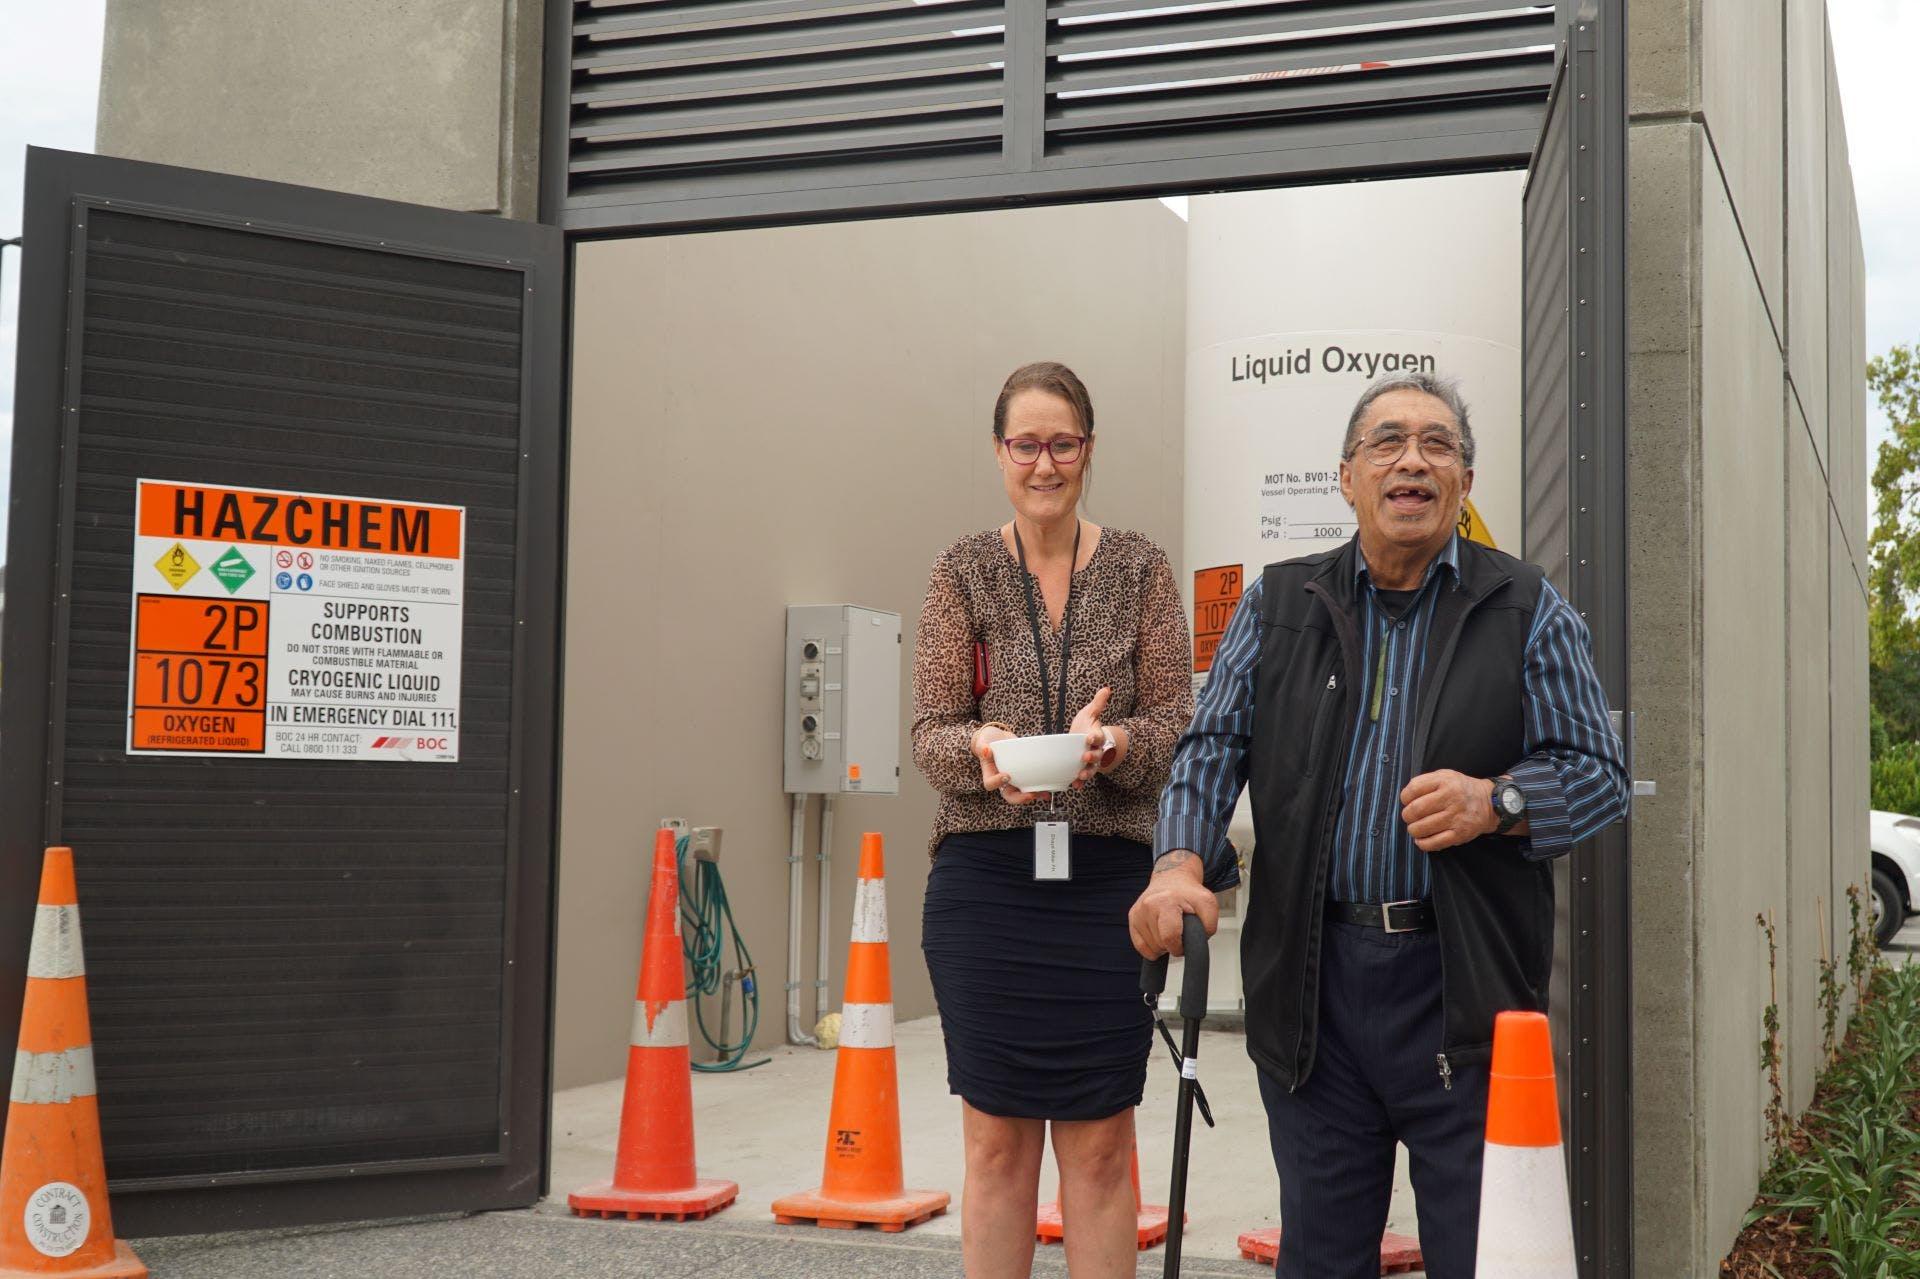 Kaumatua Kawiti Waititi at the blessing and celebration of Forté Health's new oxygen supply system.